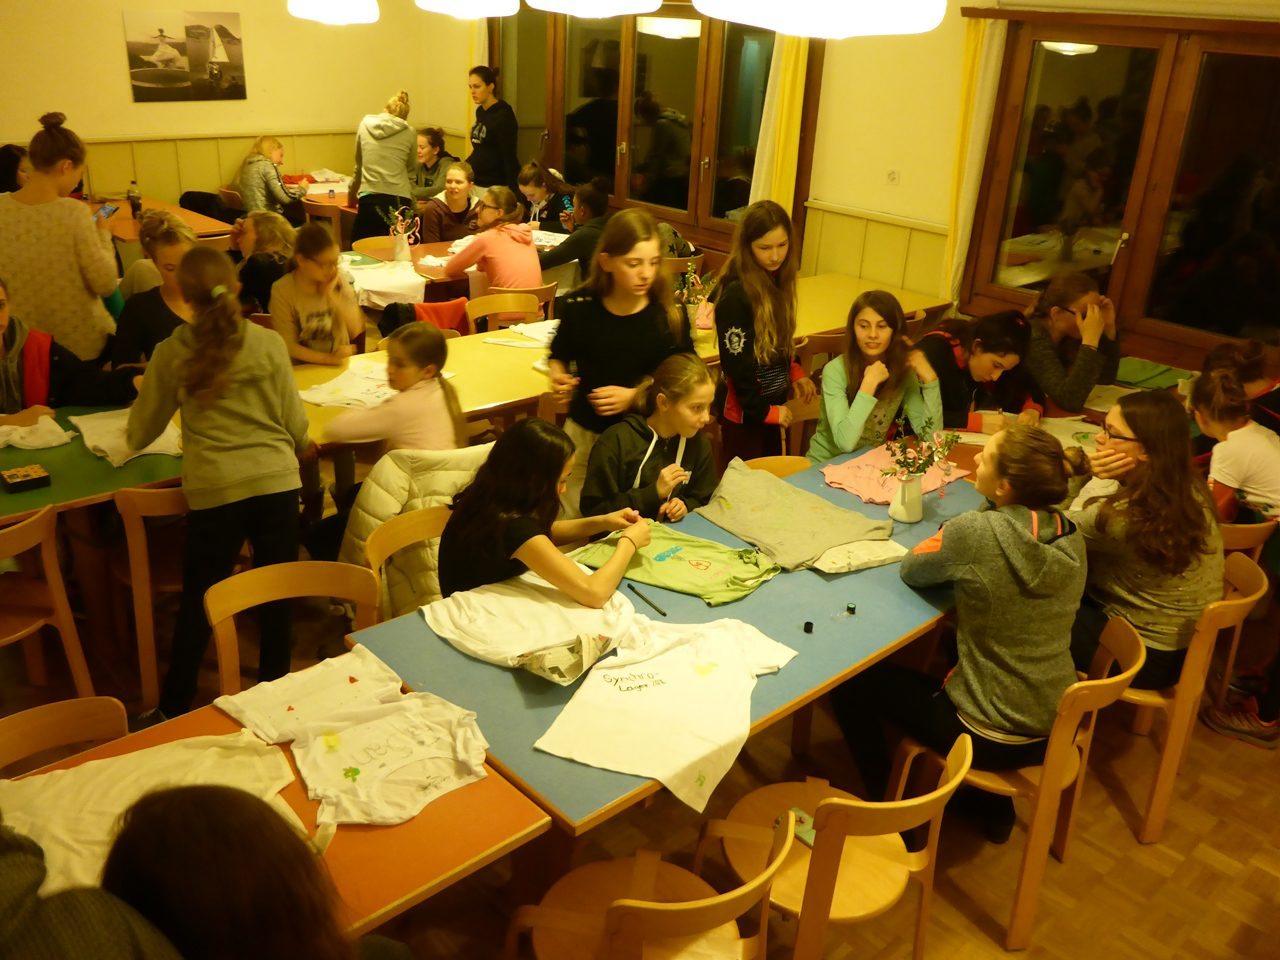 Osterlager SyBern, 25.-28.03.2016